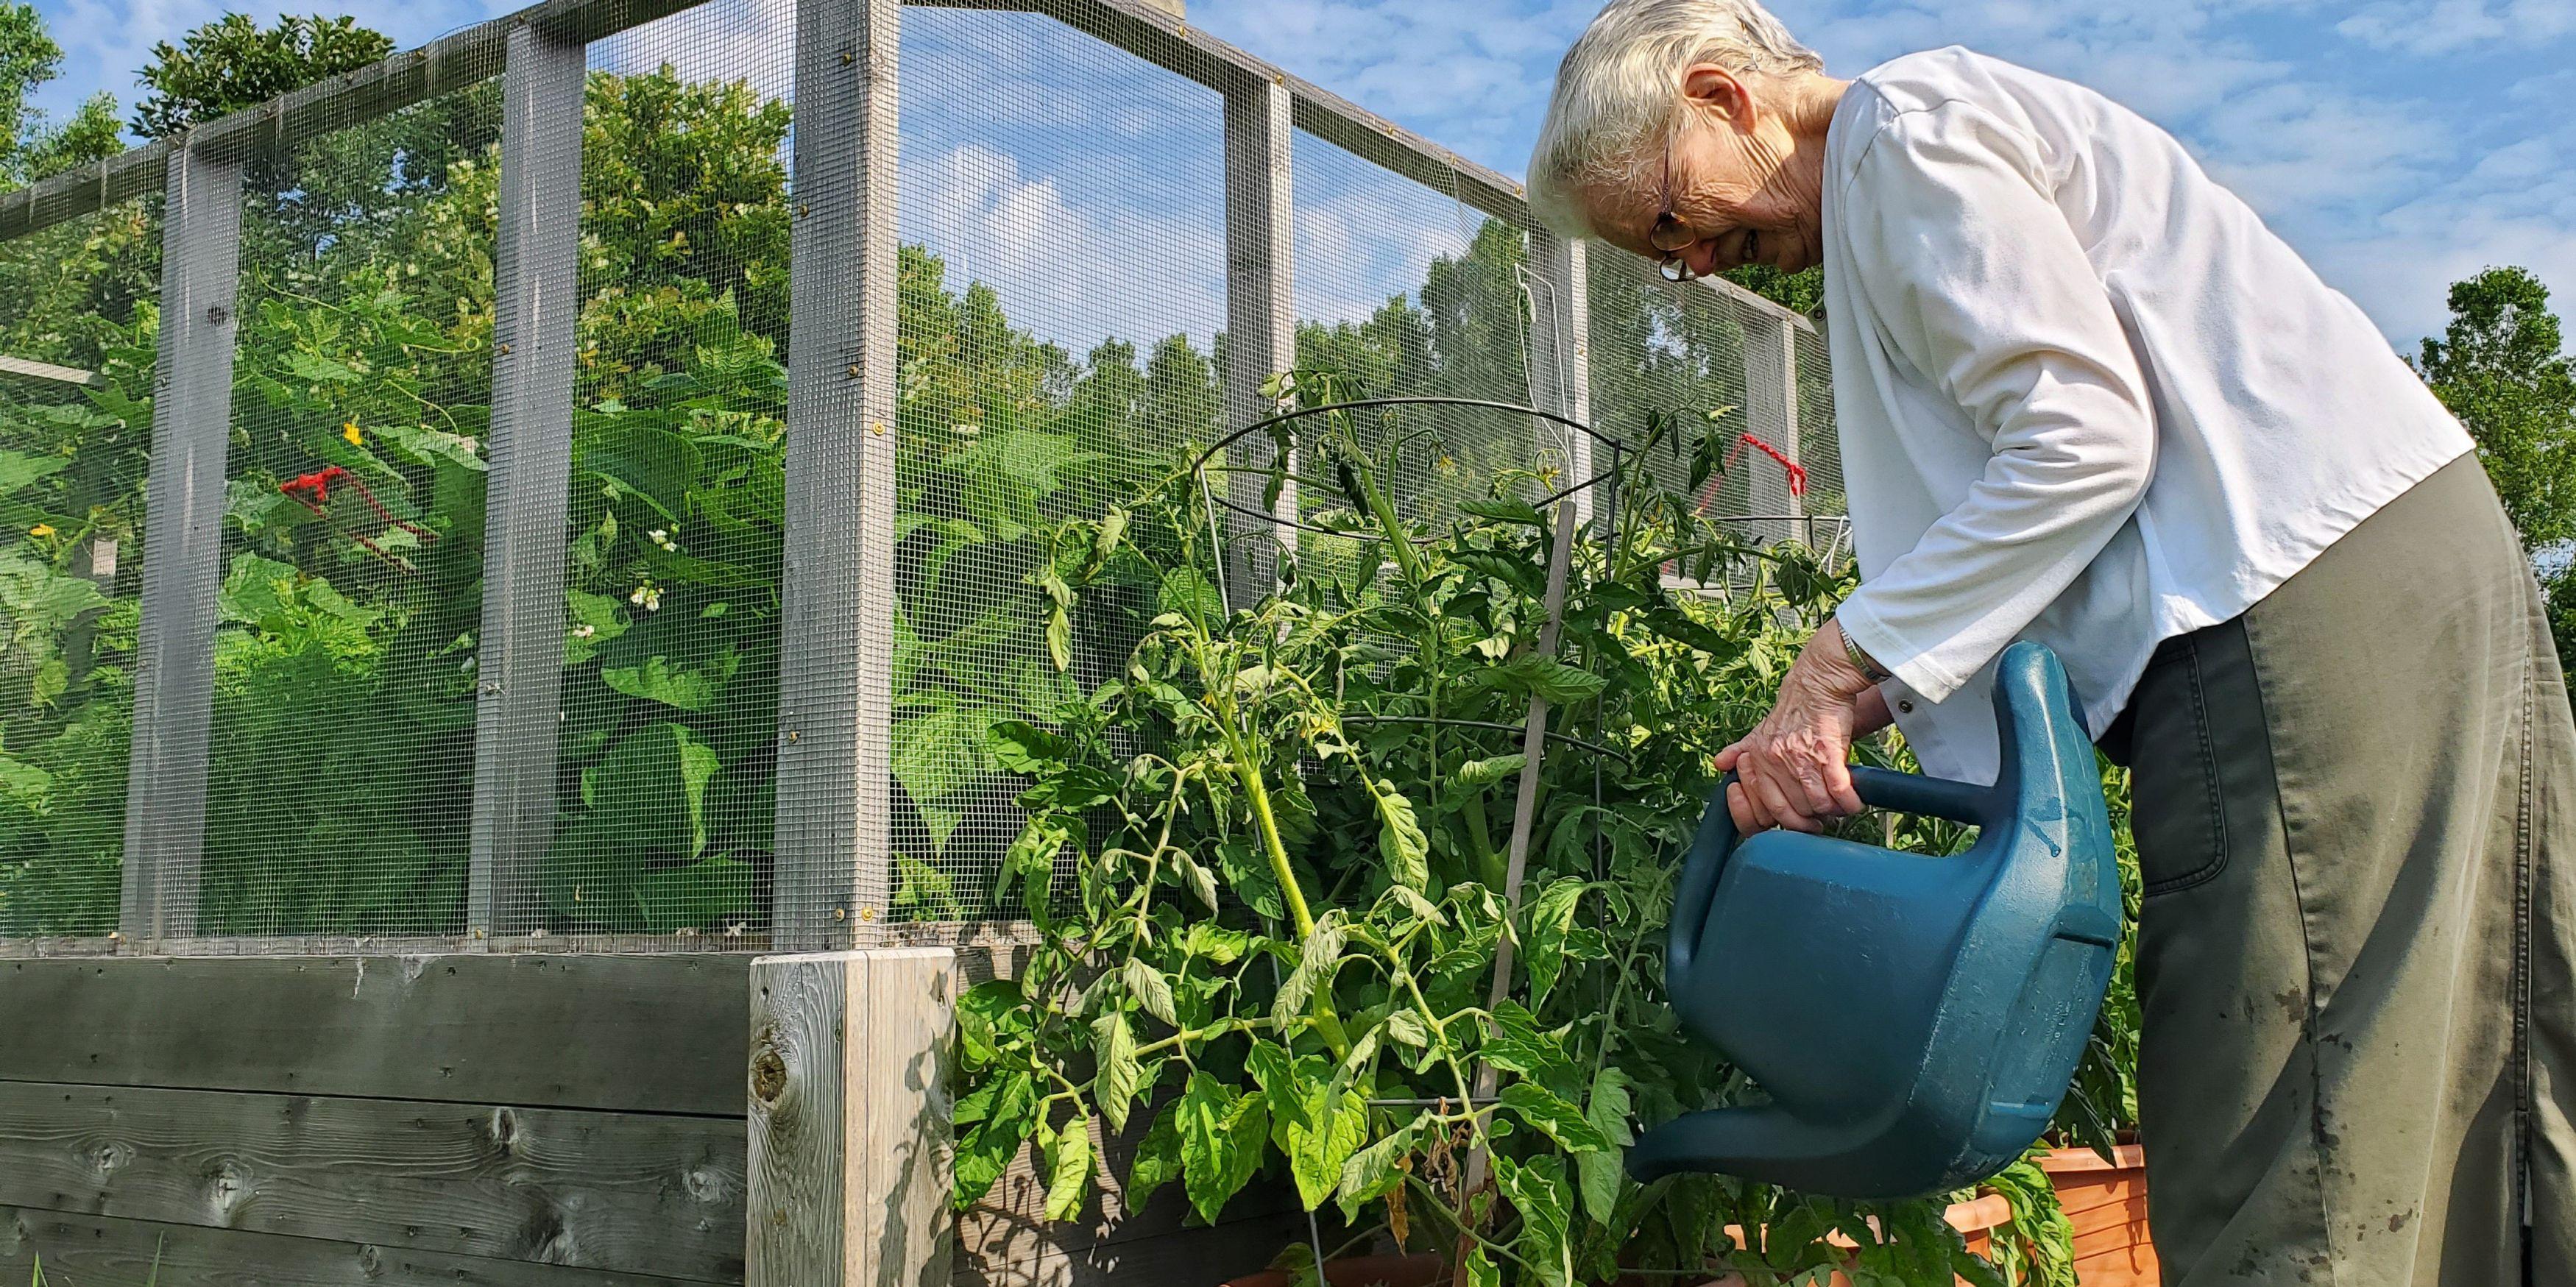 Sister Leanne waters the garden